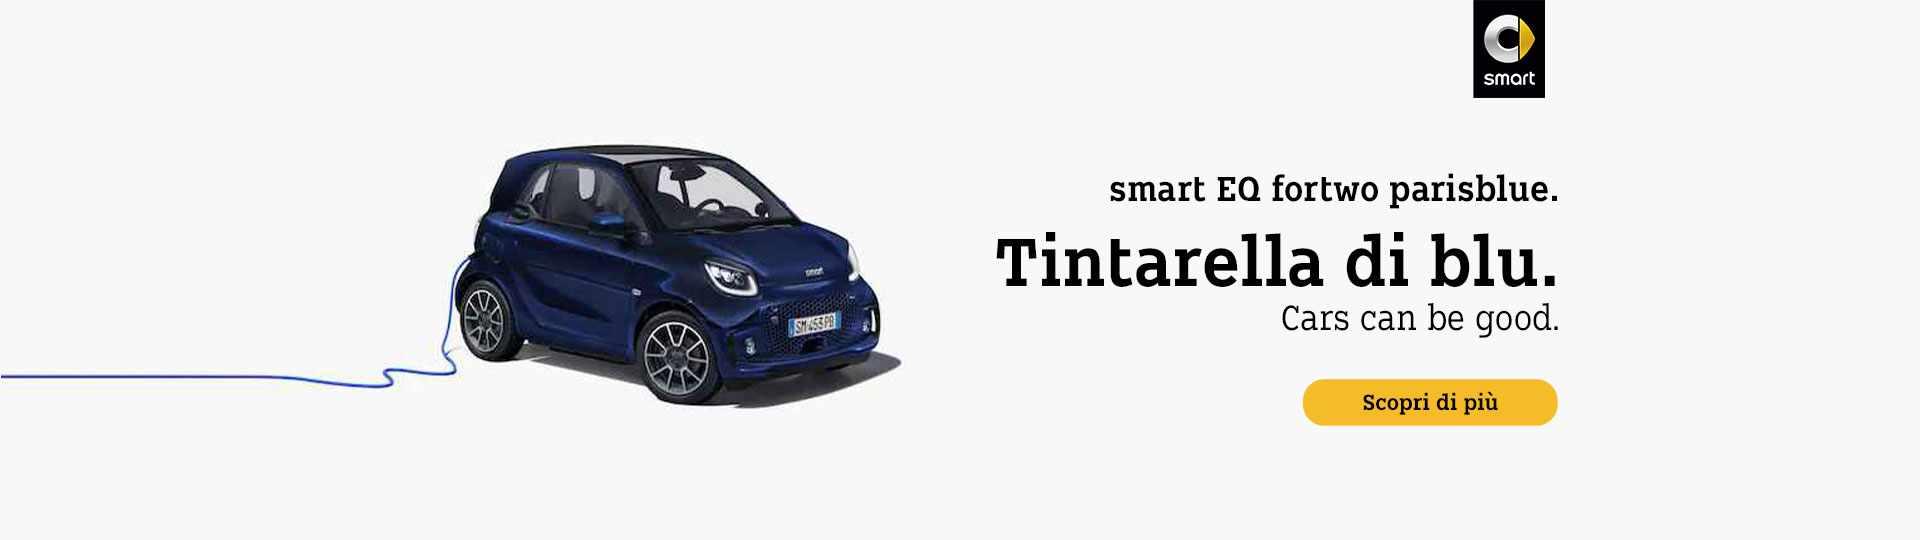 header_smart_parisblue_giugno_2021.jpg